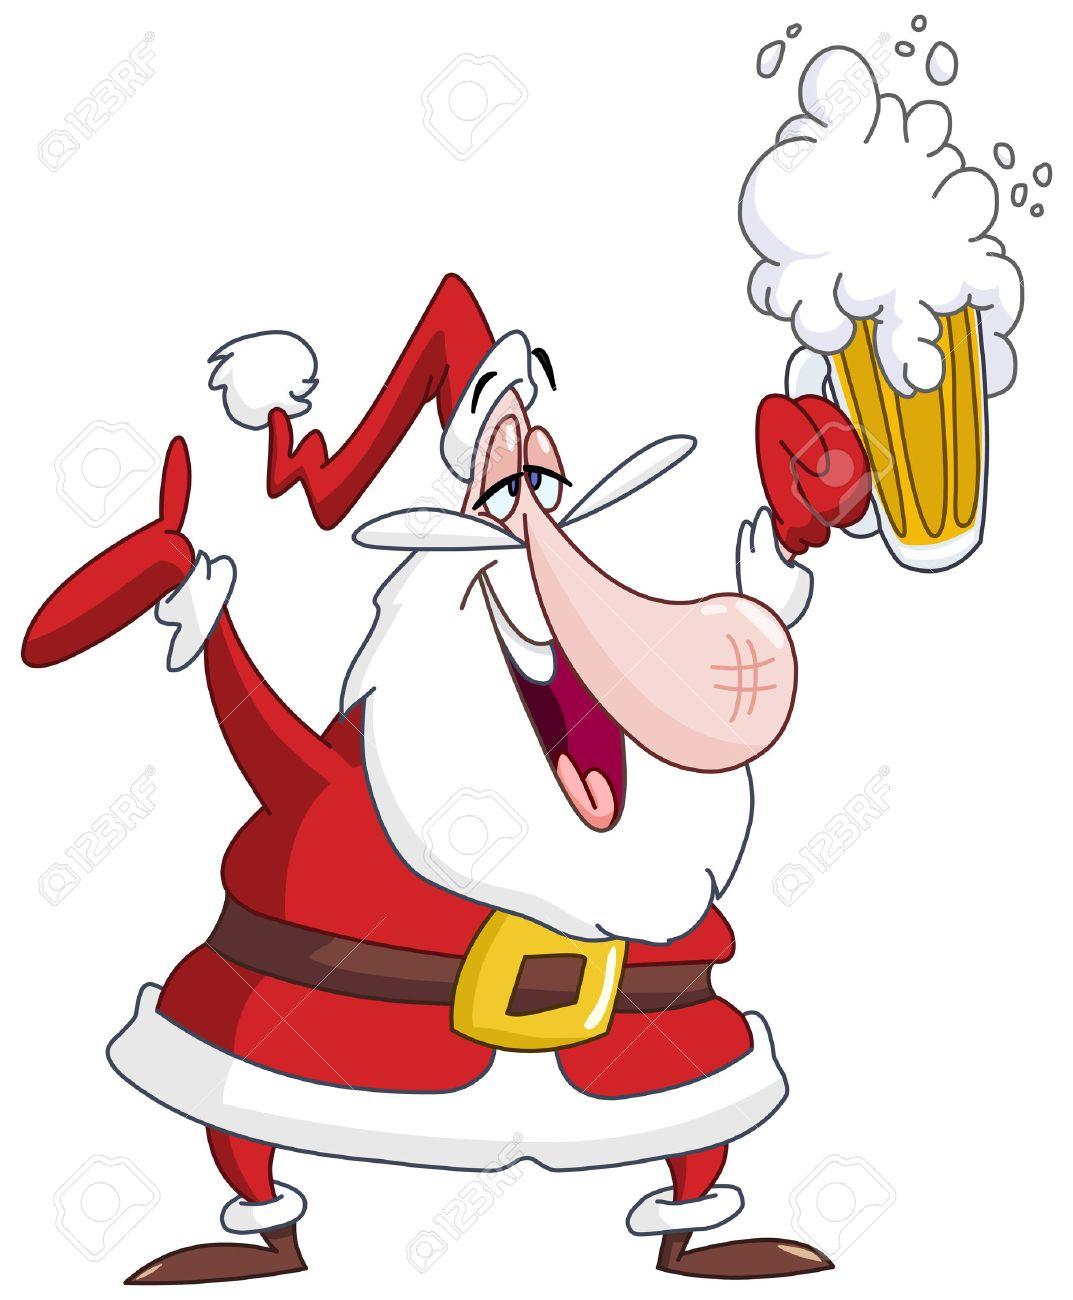 Drunk Santa Claus with beer - 33242369